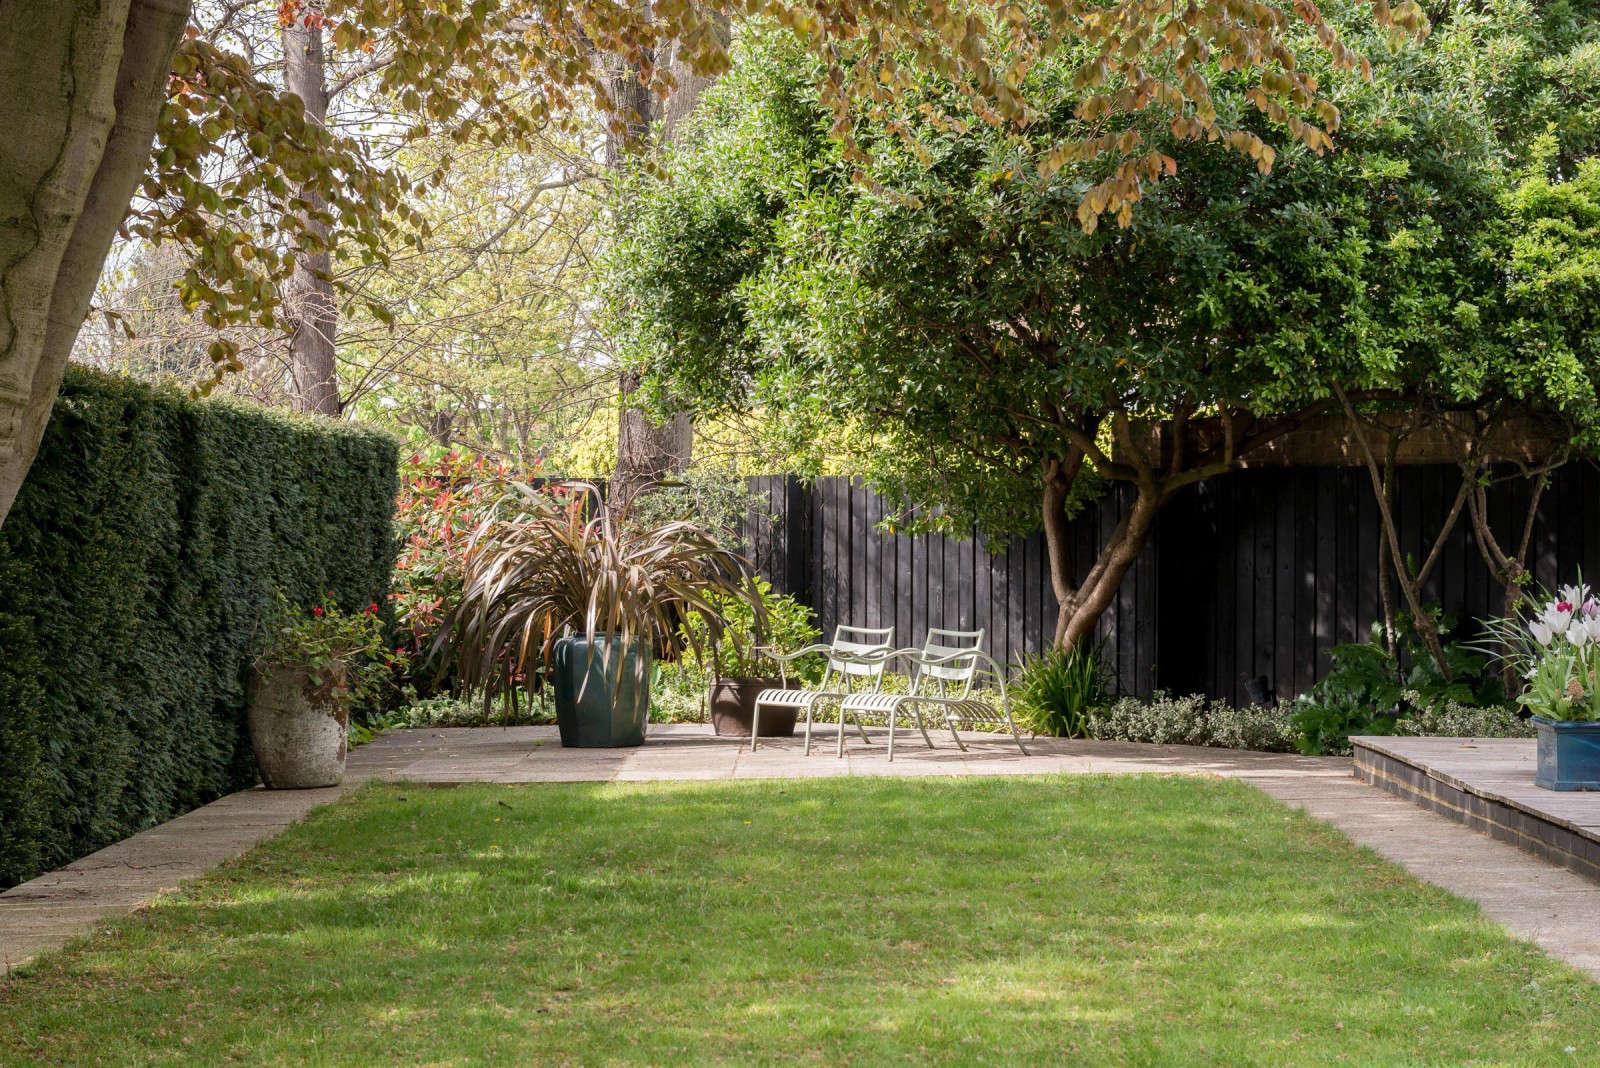 trees london backyard lawn hedges themodernhouse belsize lane